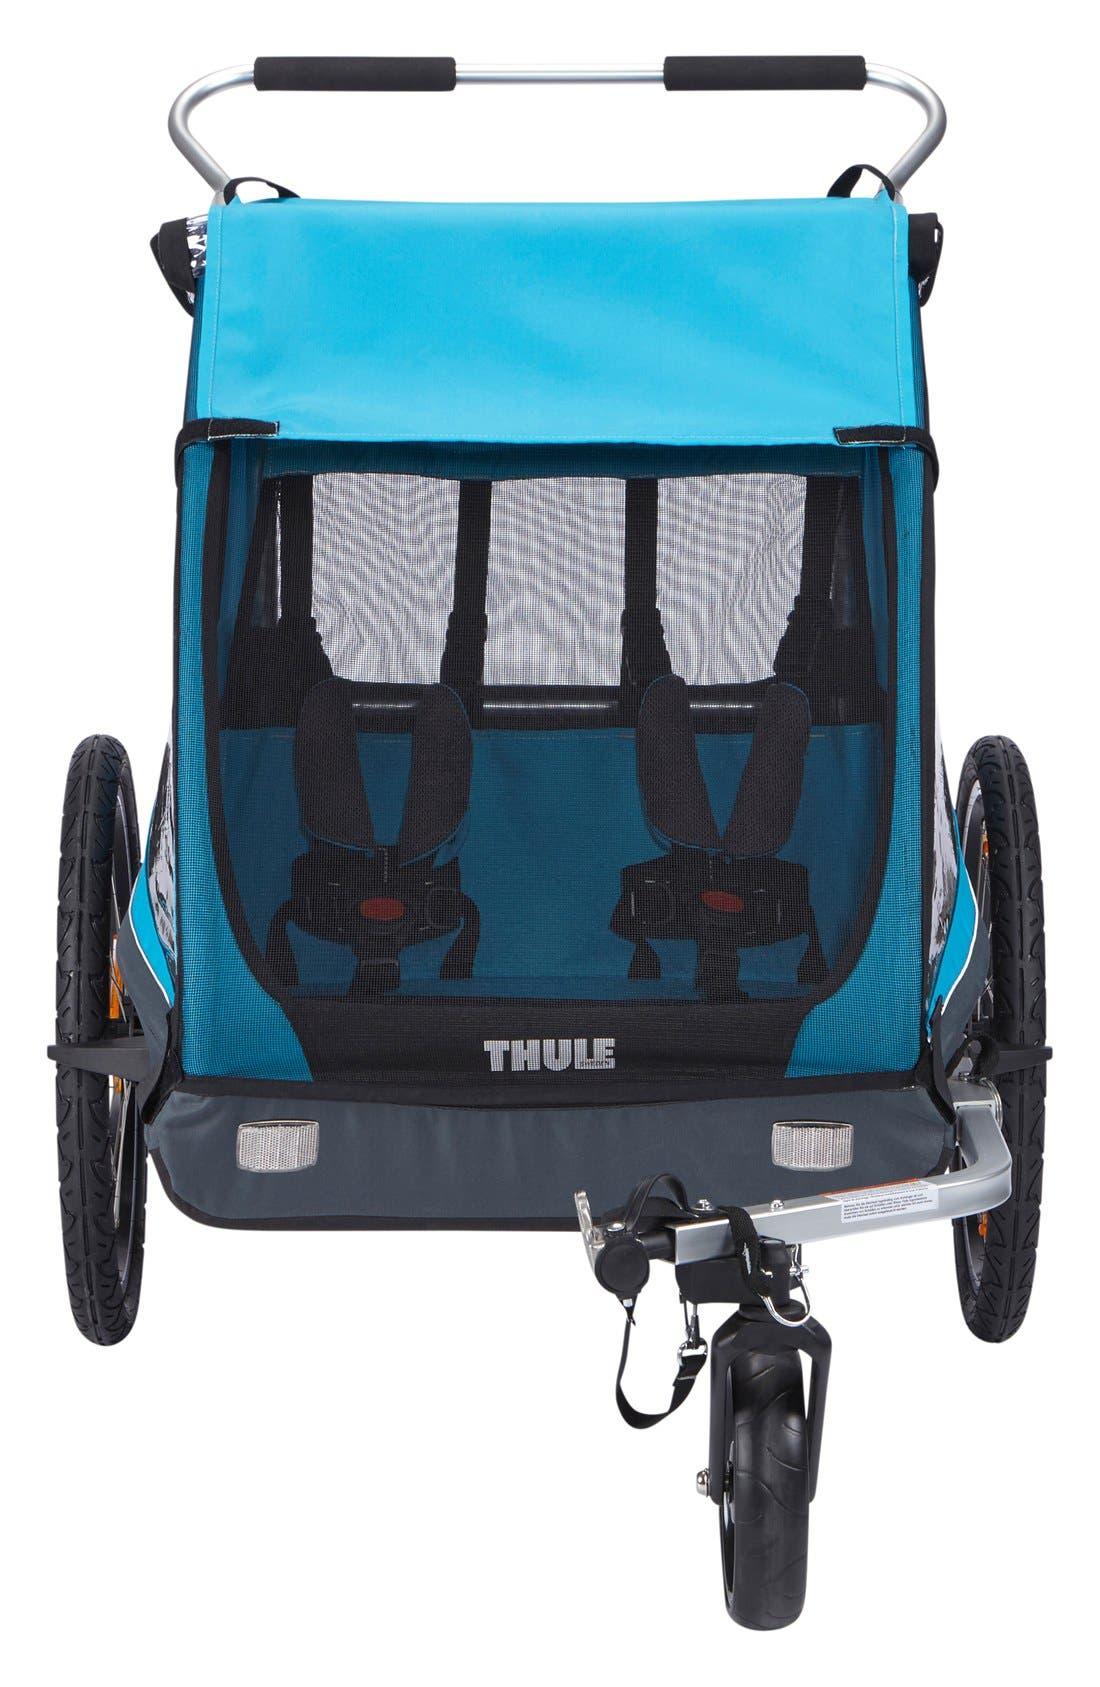 Coaster XT Double Seat Bike Trailer,                         Main,                         color, BLUE